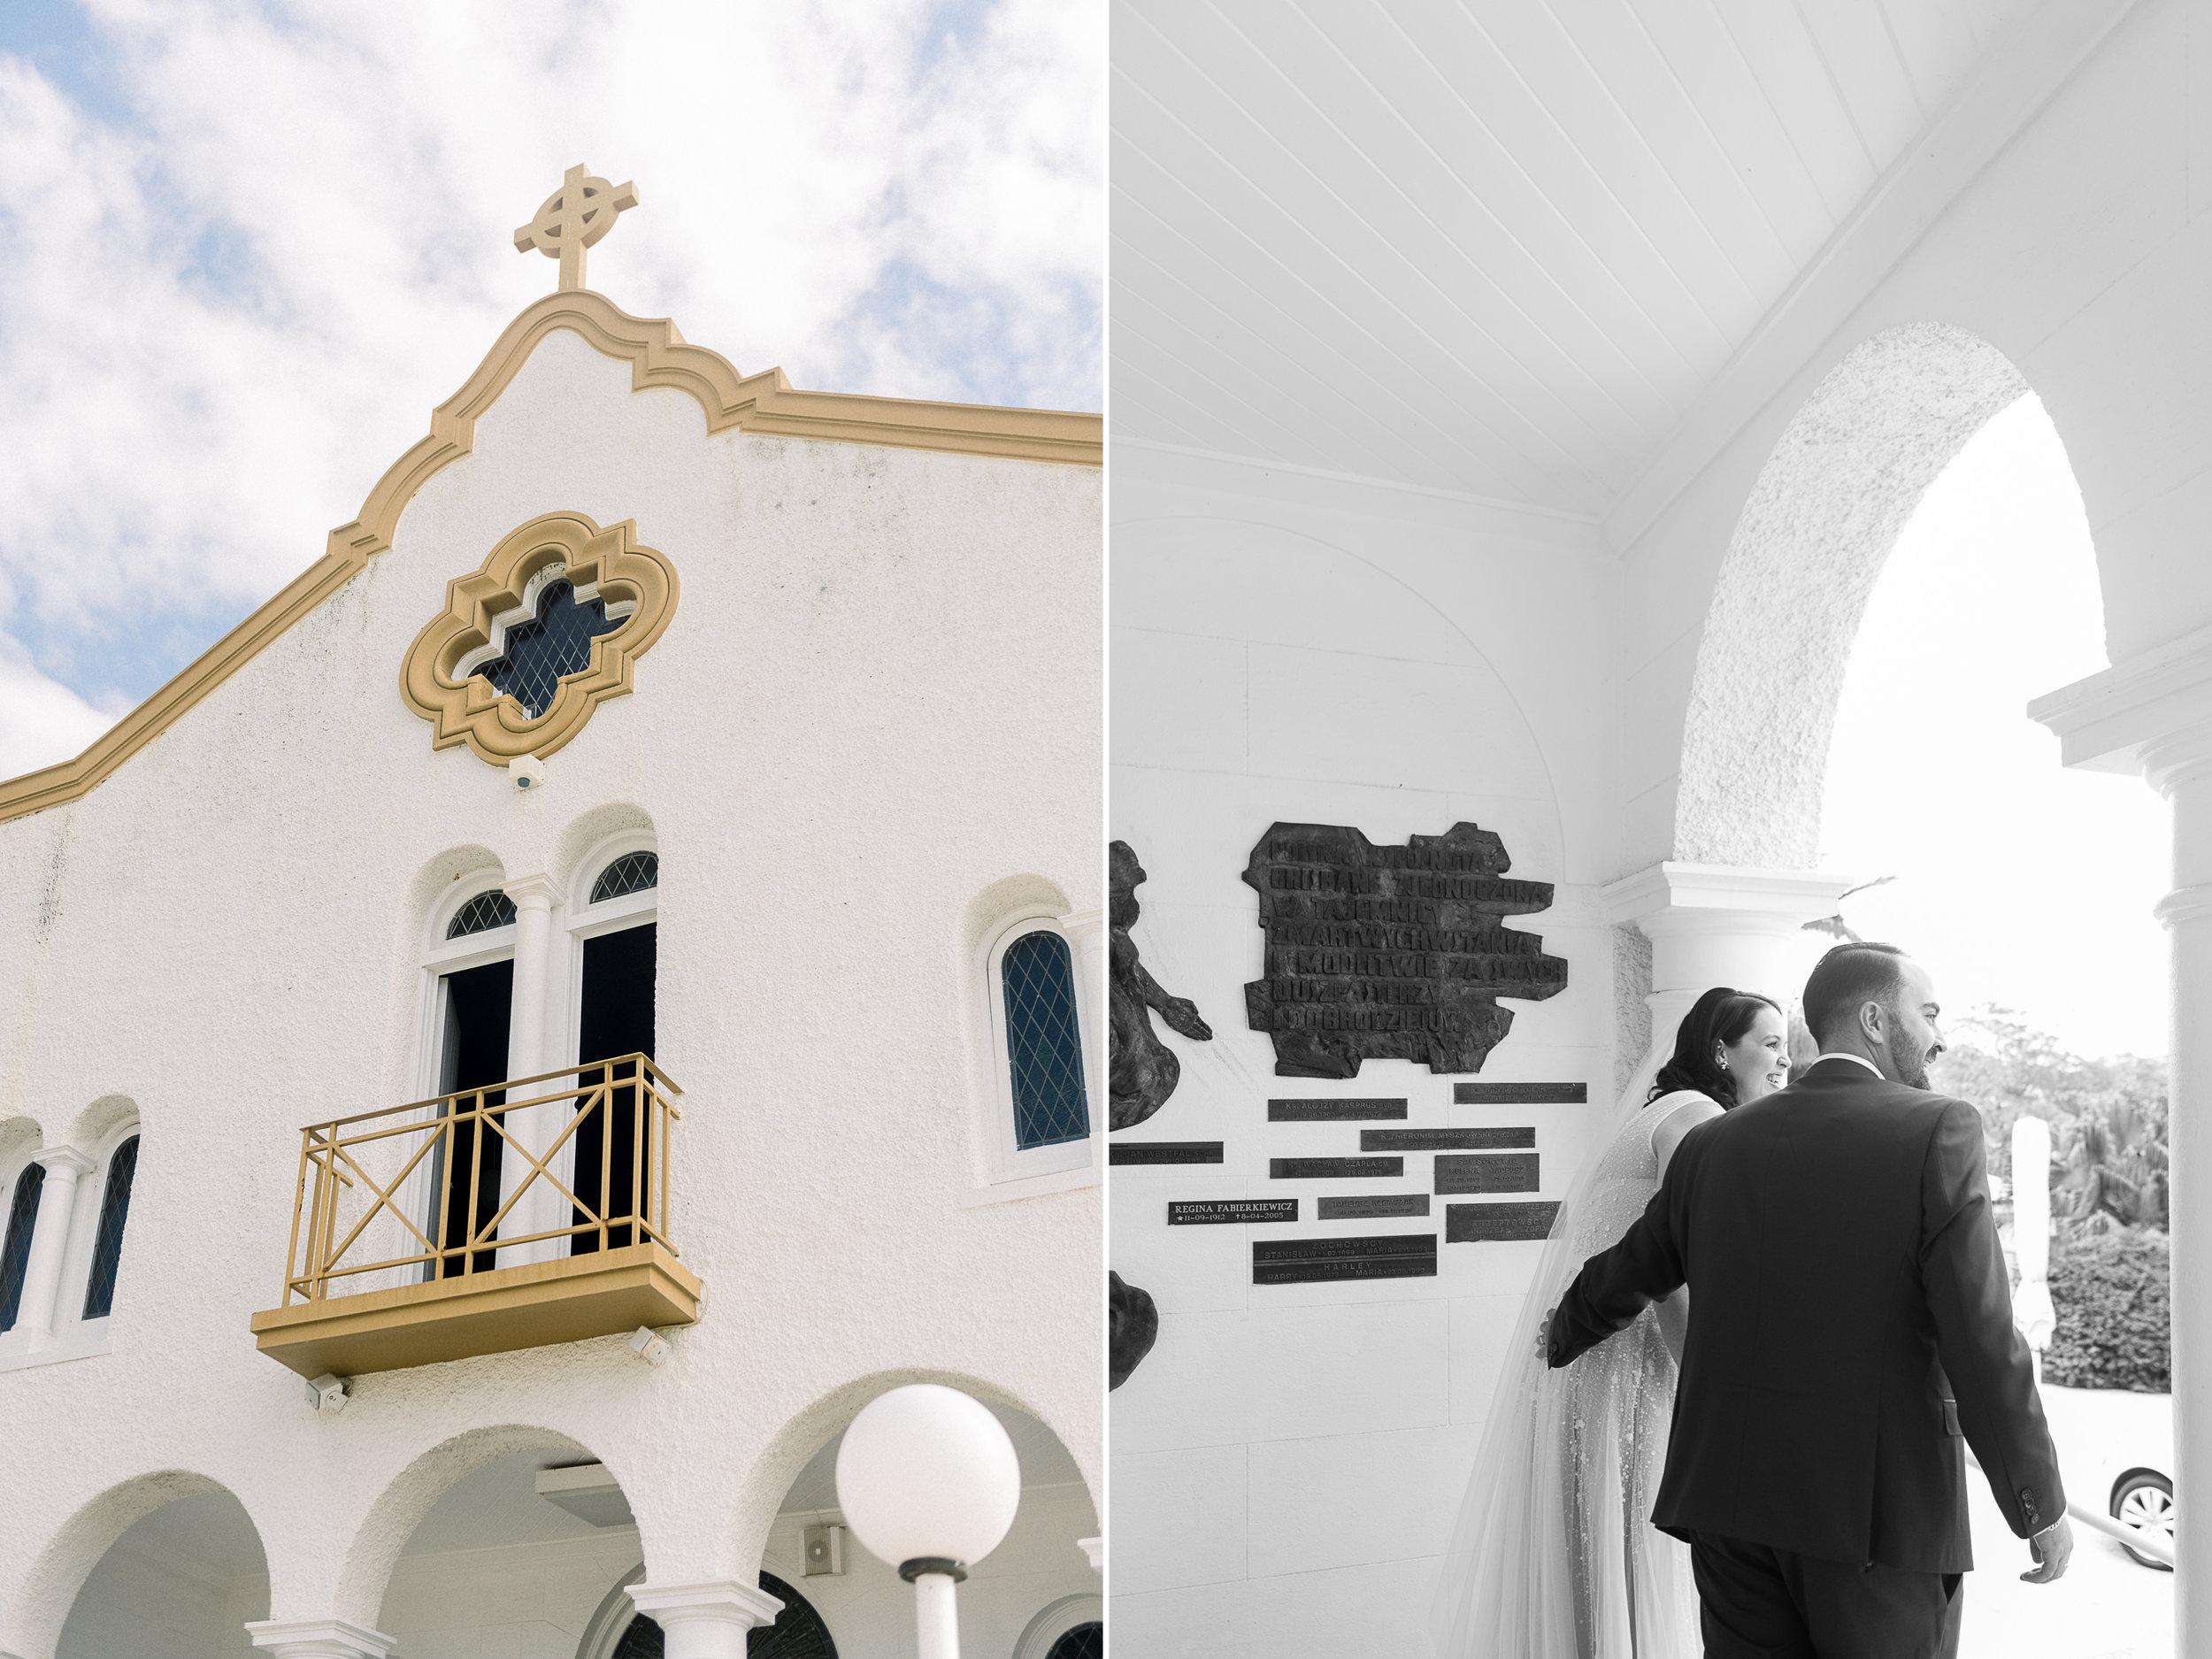 brisbane-city-wedding-church-ceremony-wedding-7.jpg